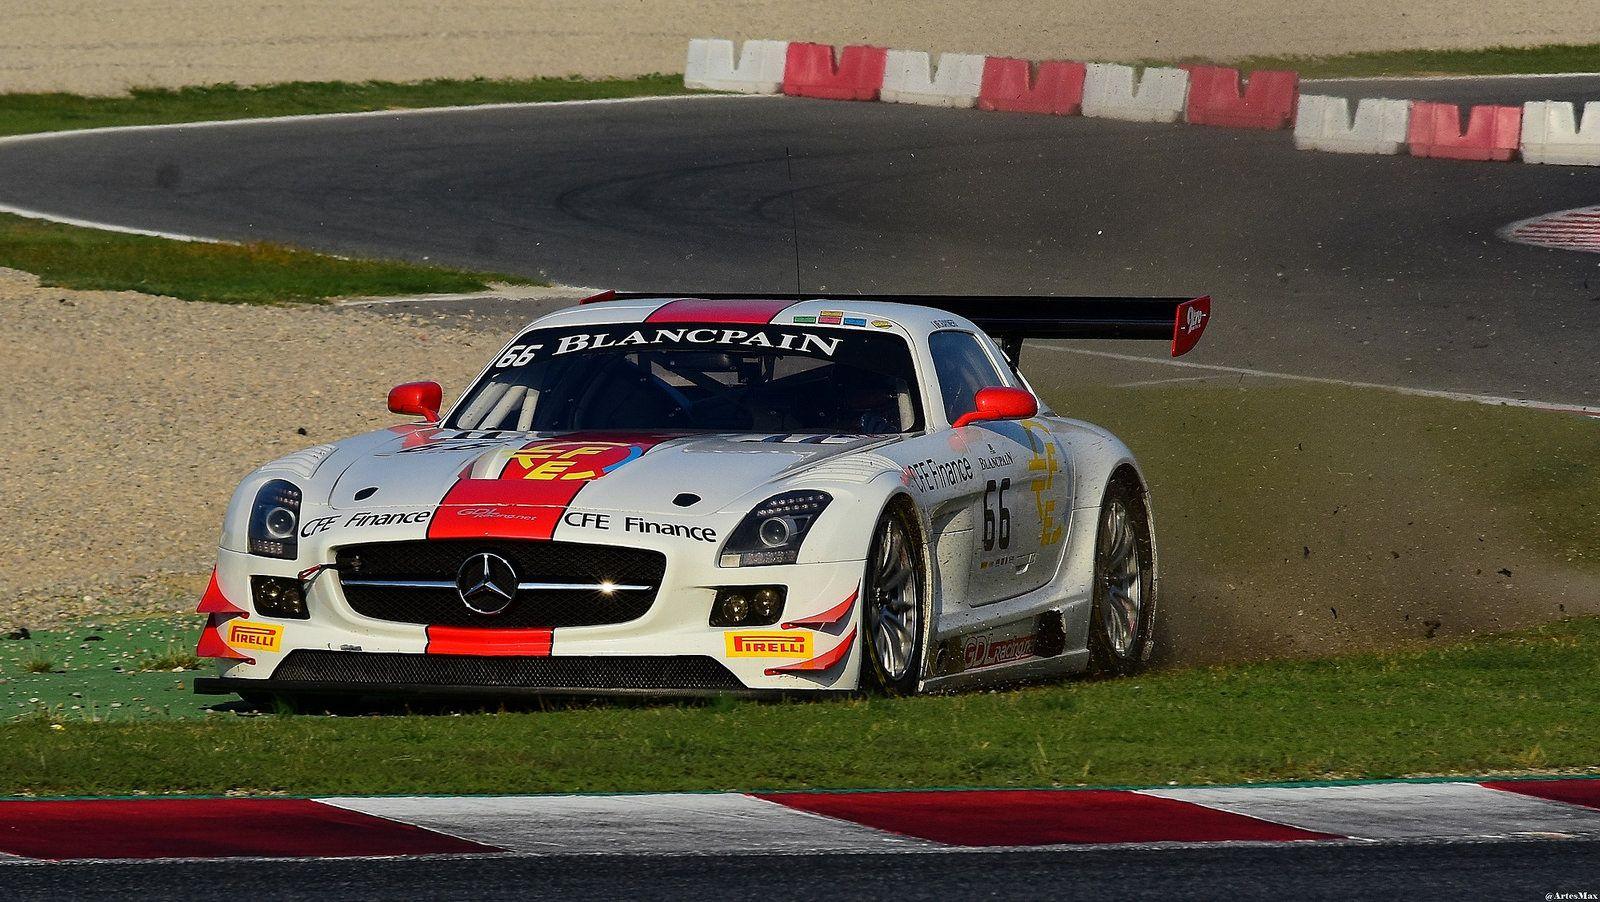 Pin On Gt Series Racing Cars